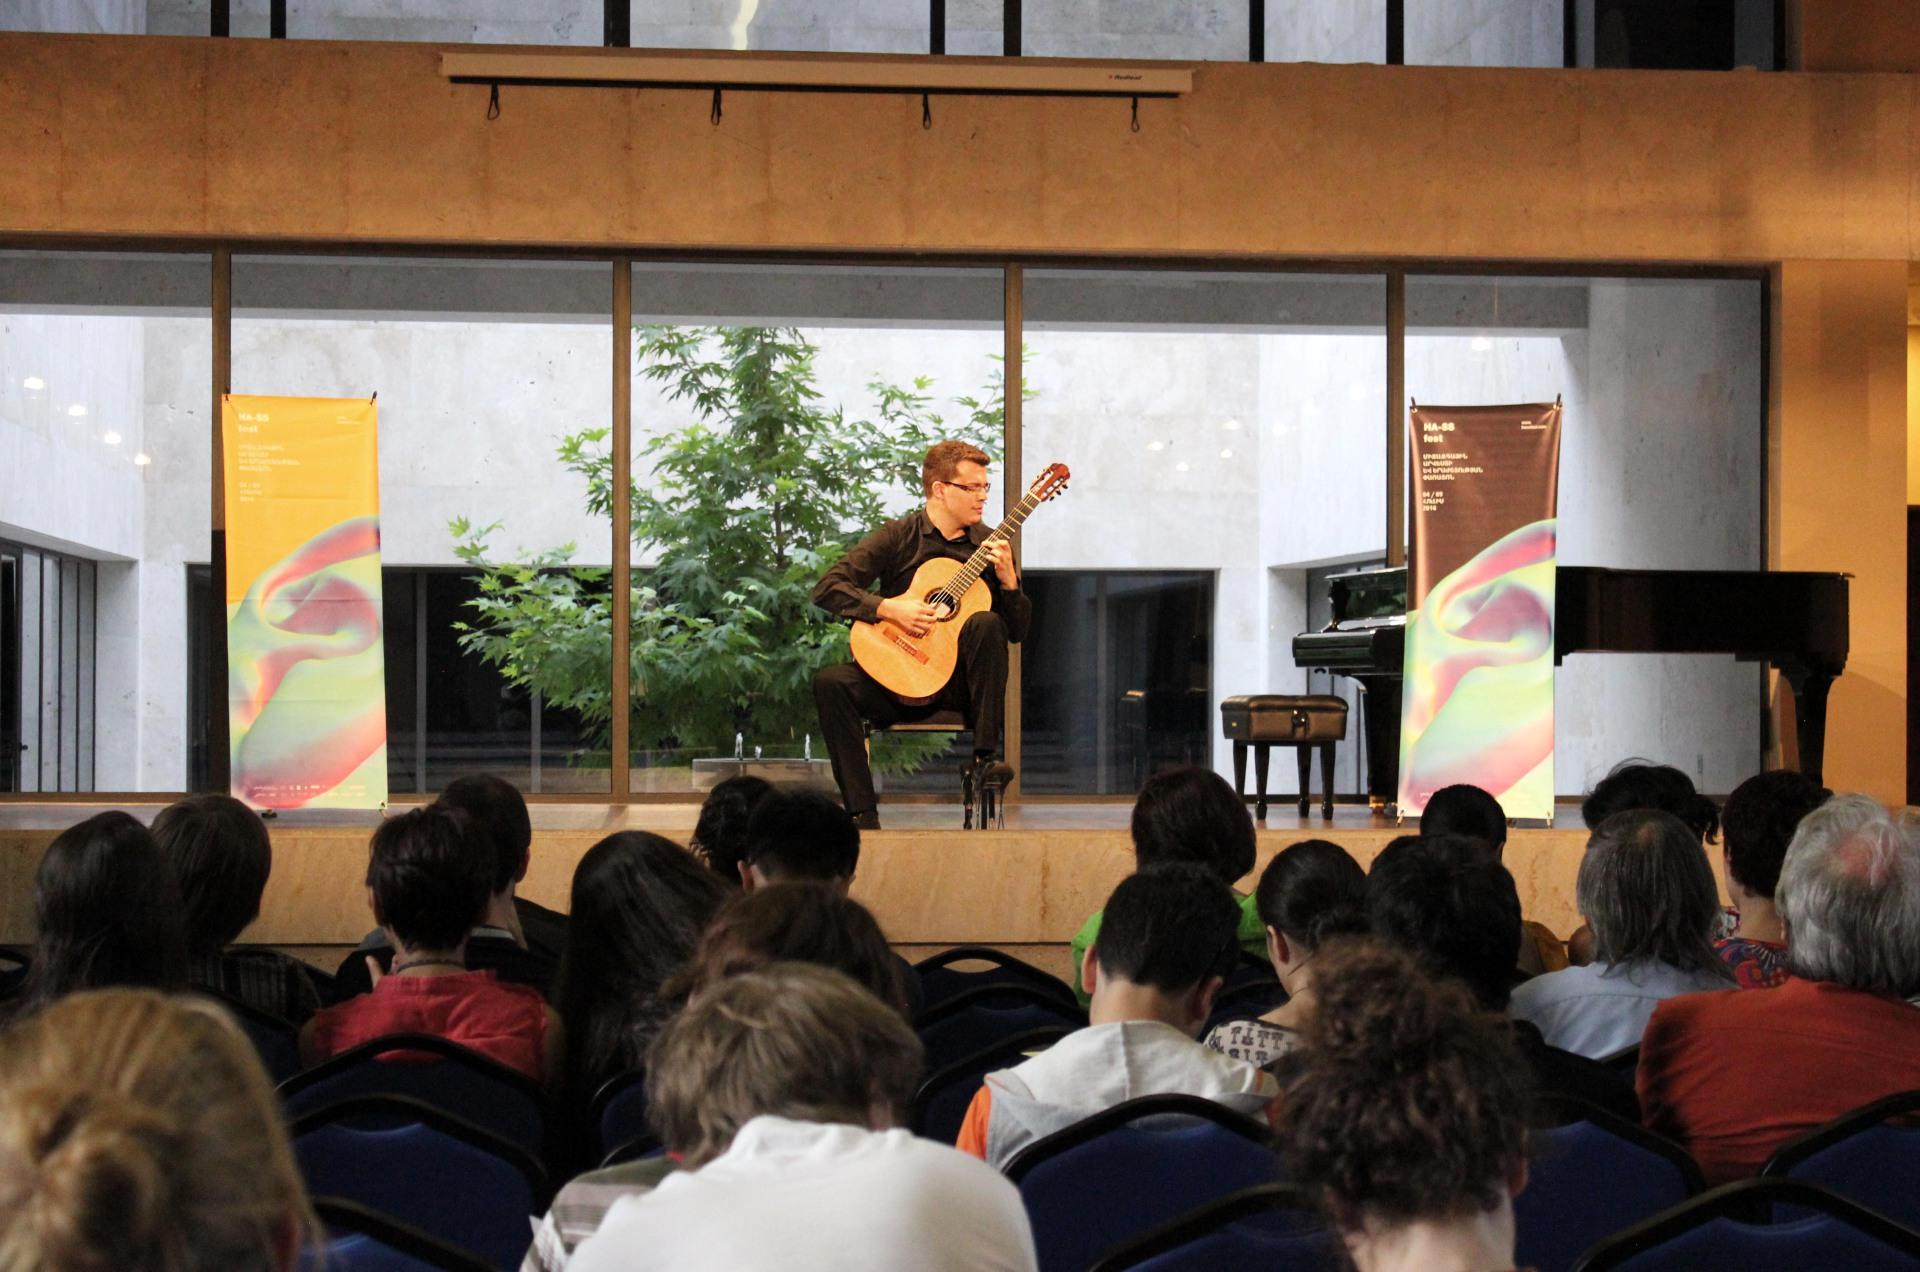 Srdjan Bulat Solo Guitar Concert